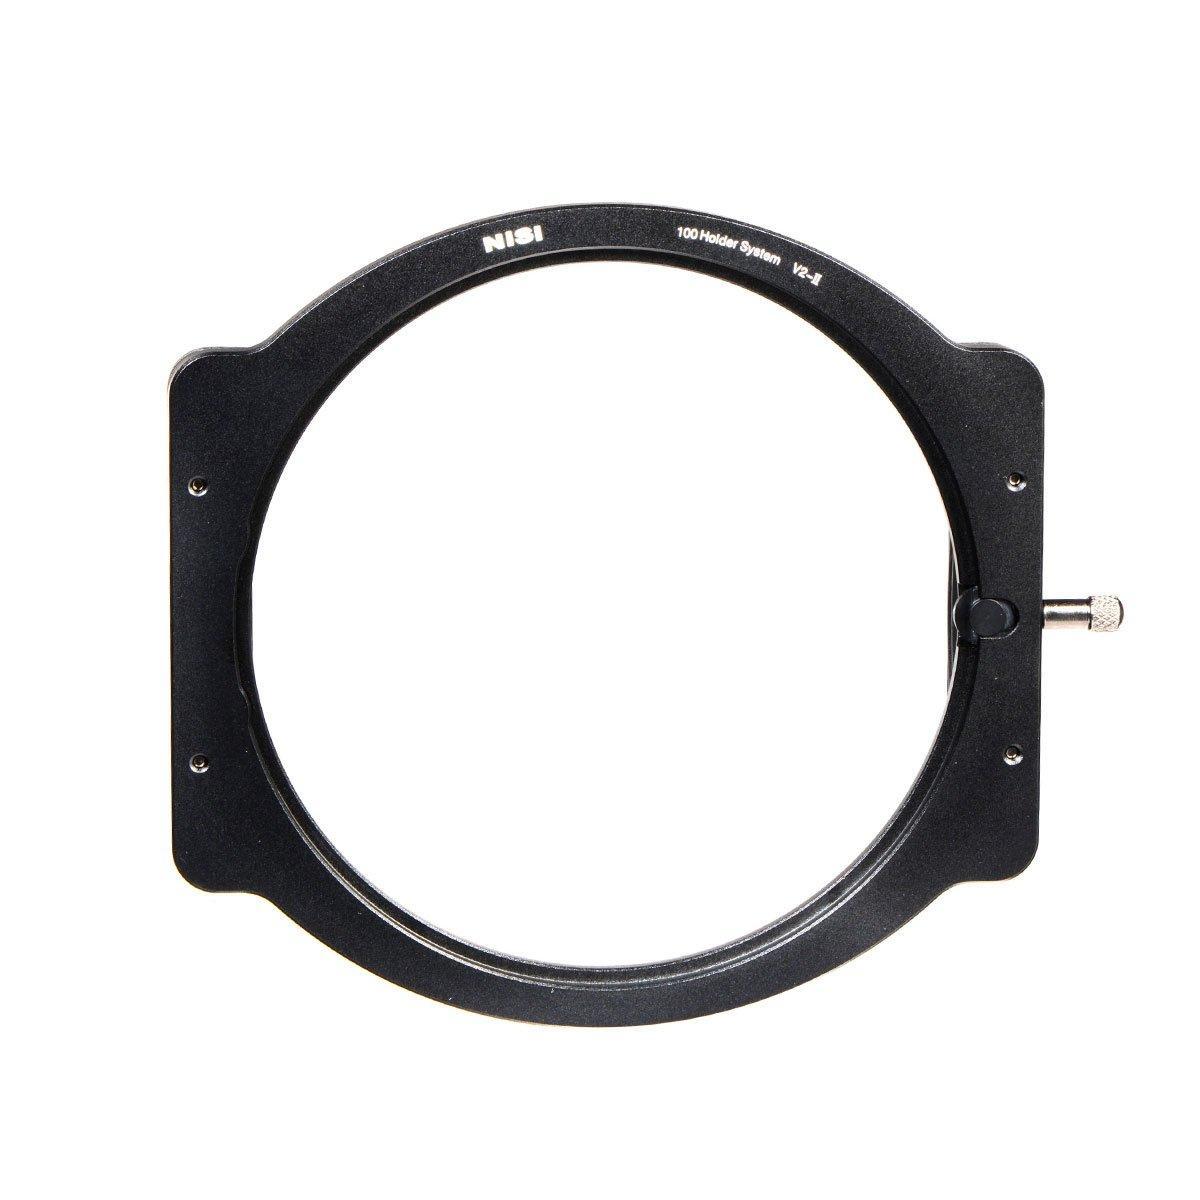 NiSi 100mm Aluminum Filter Holder V2-II